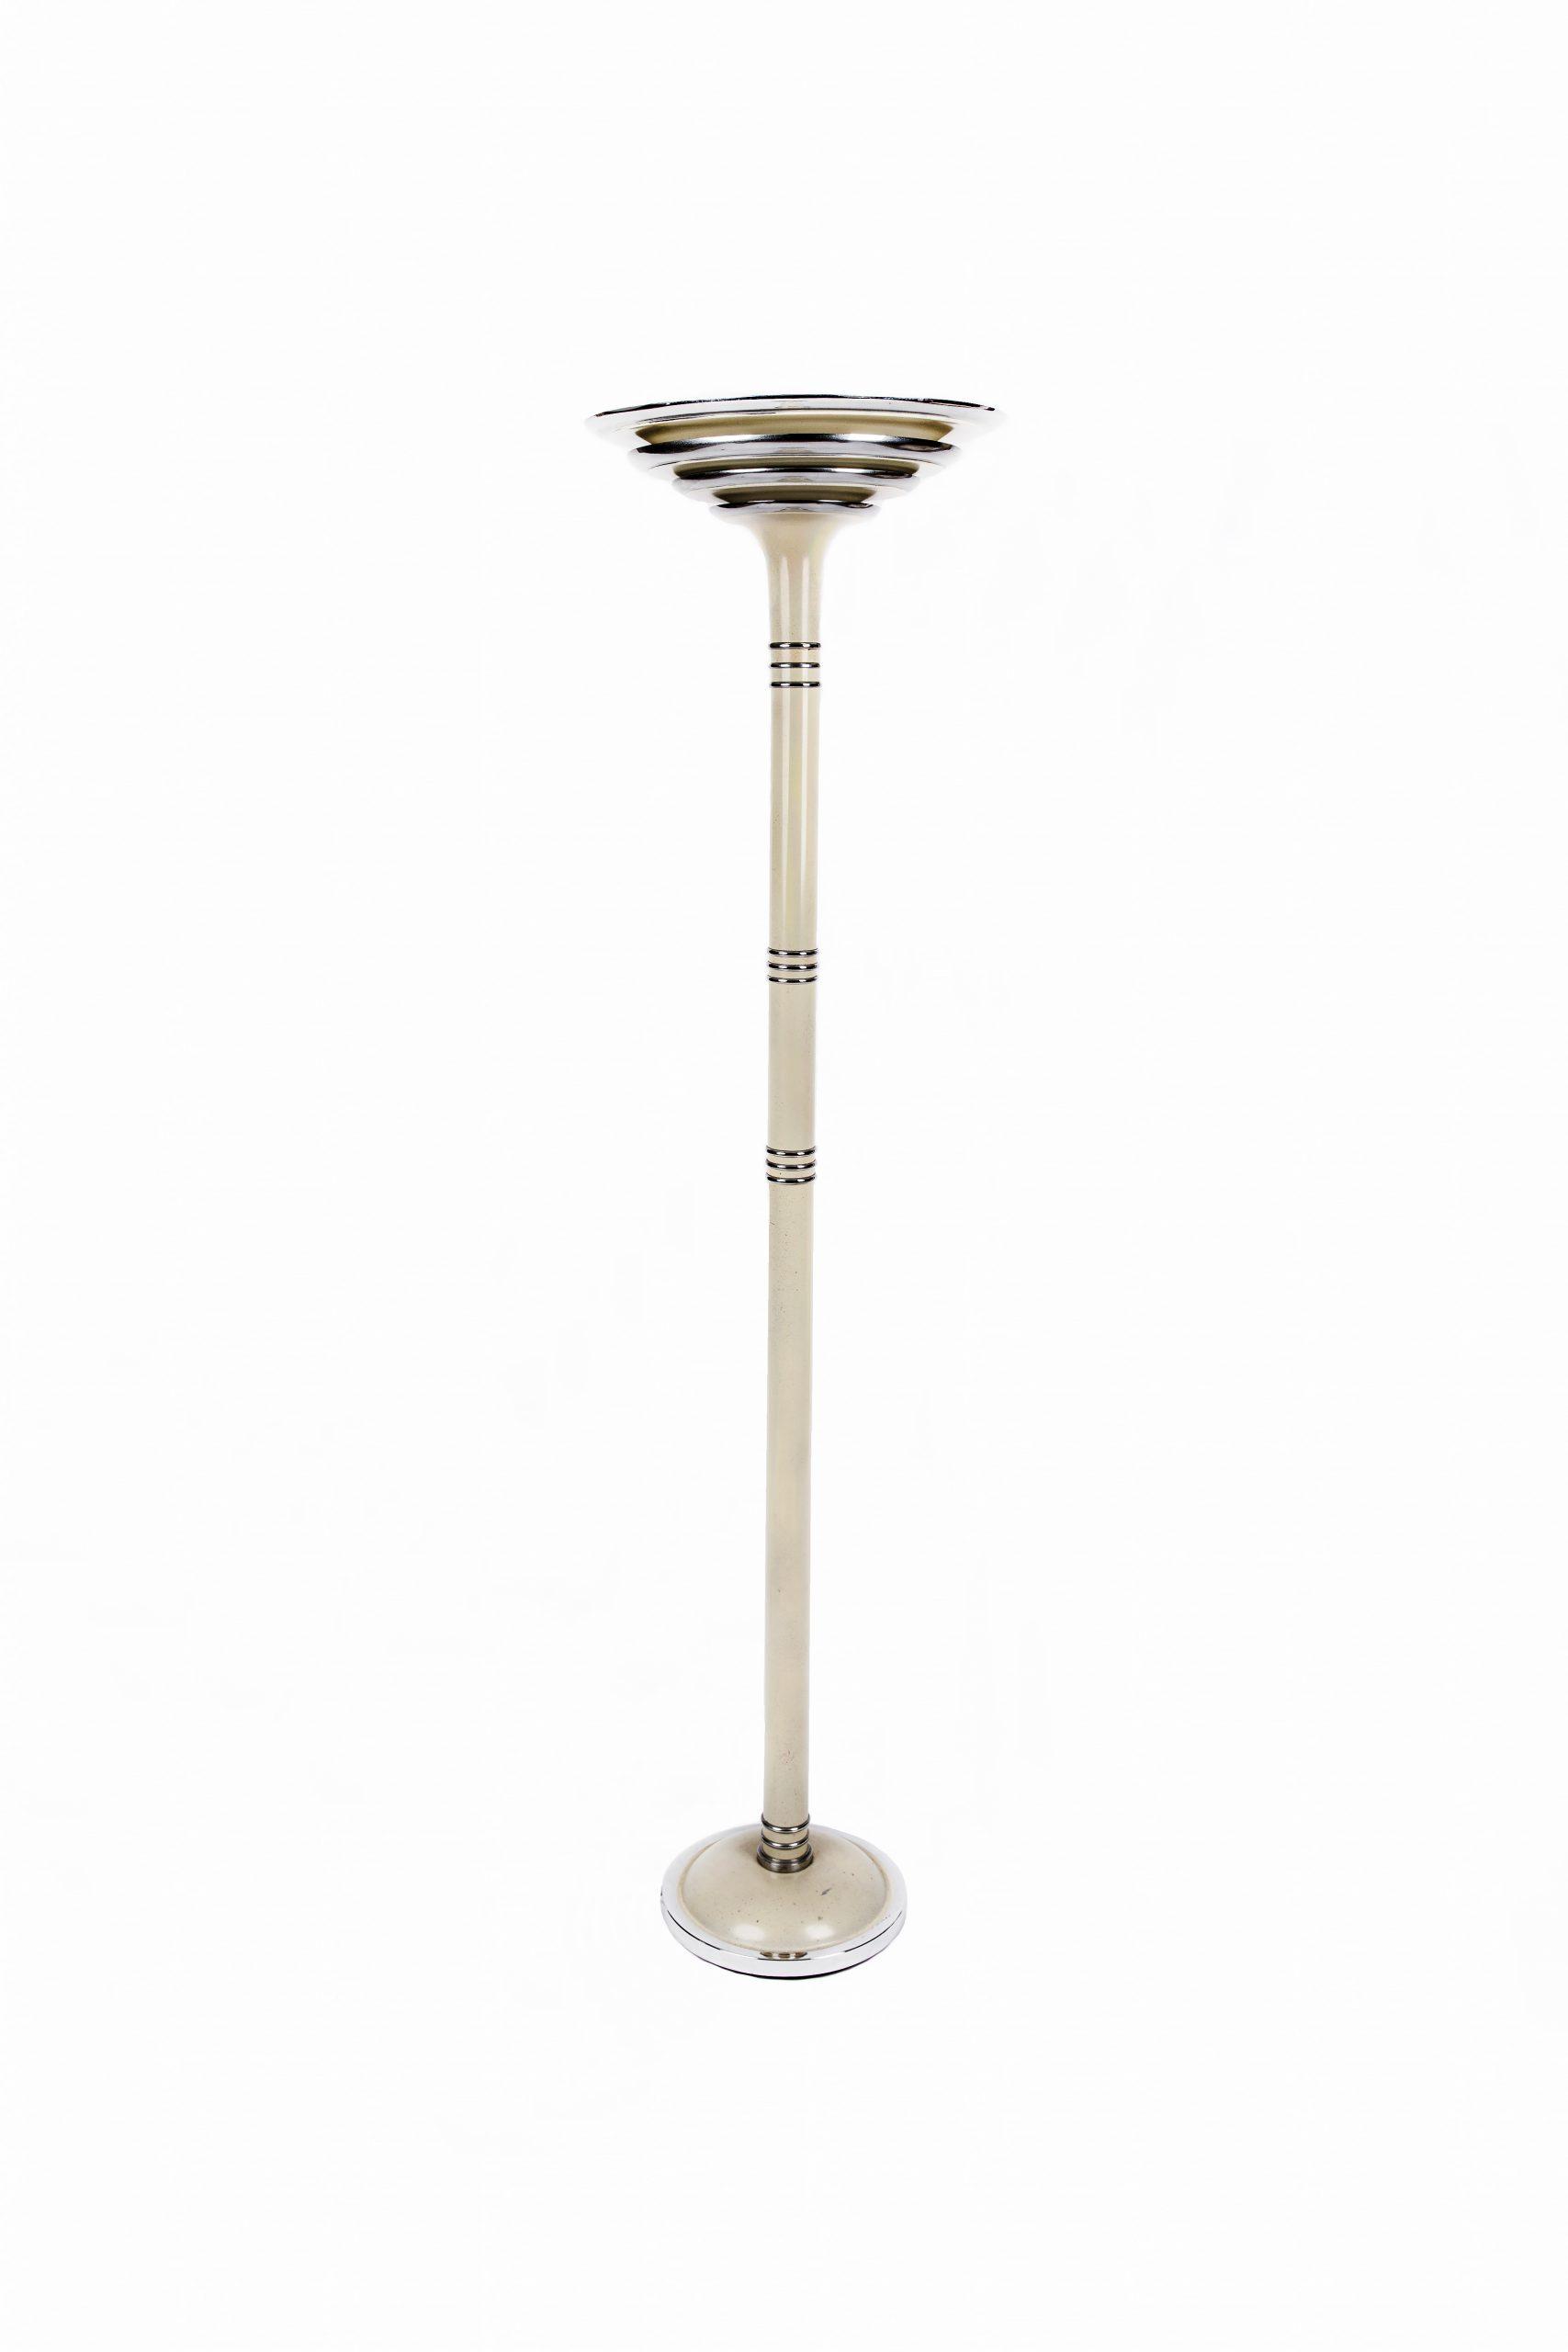 Art-deco floorlamp